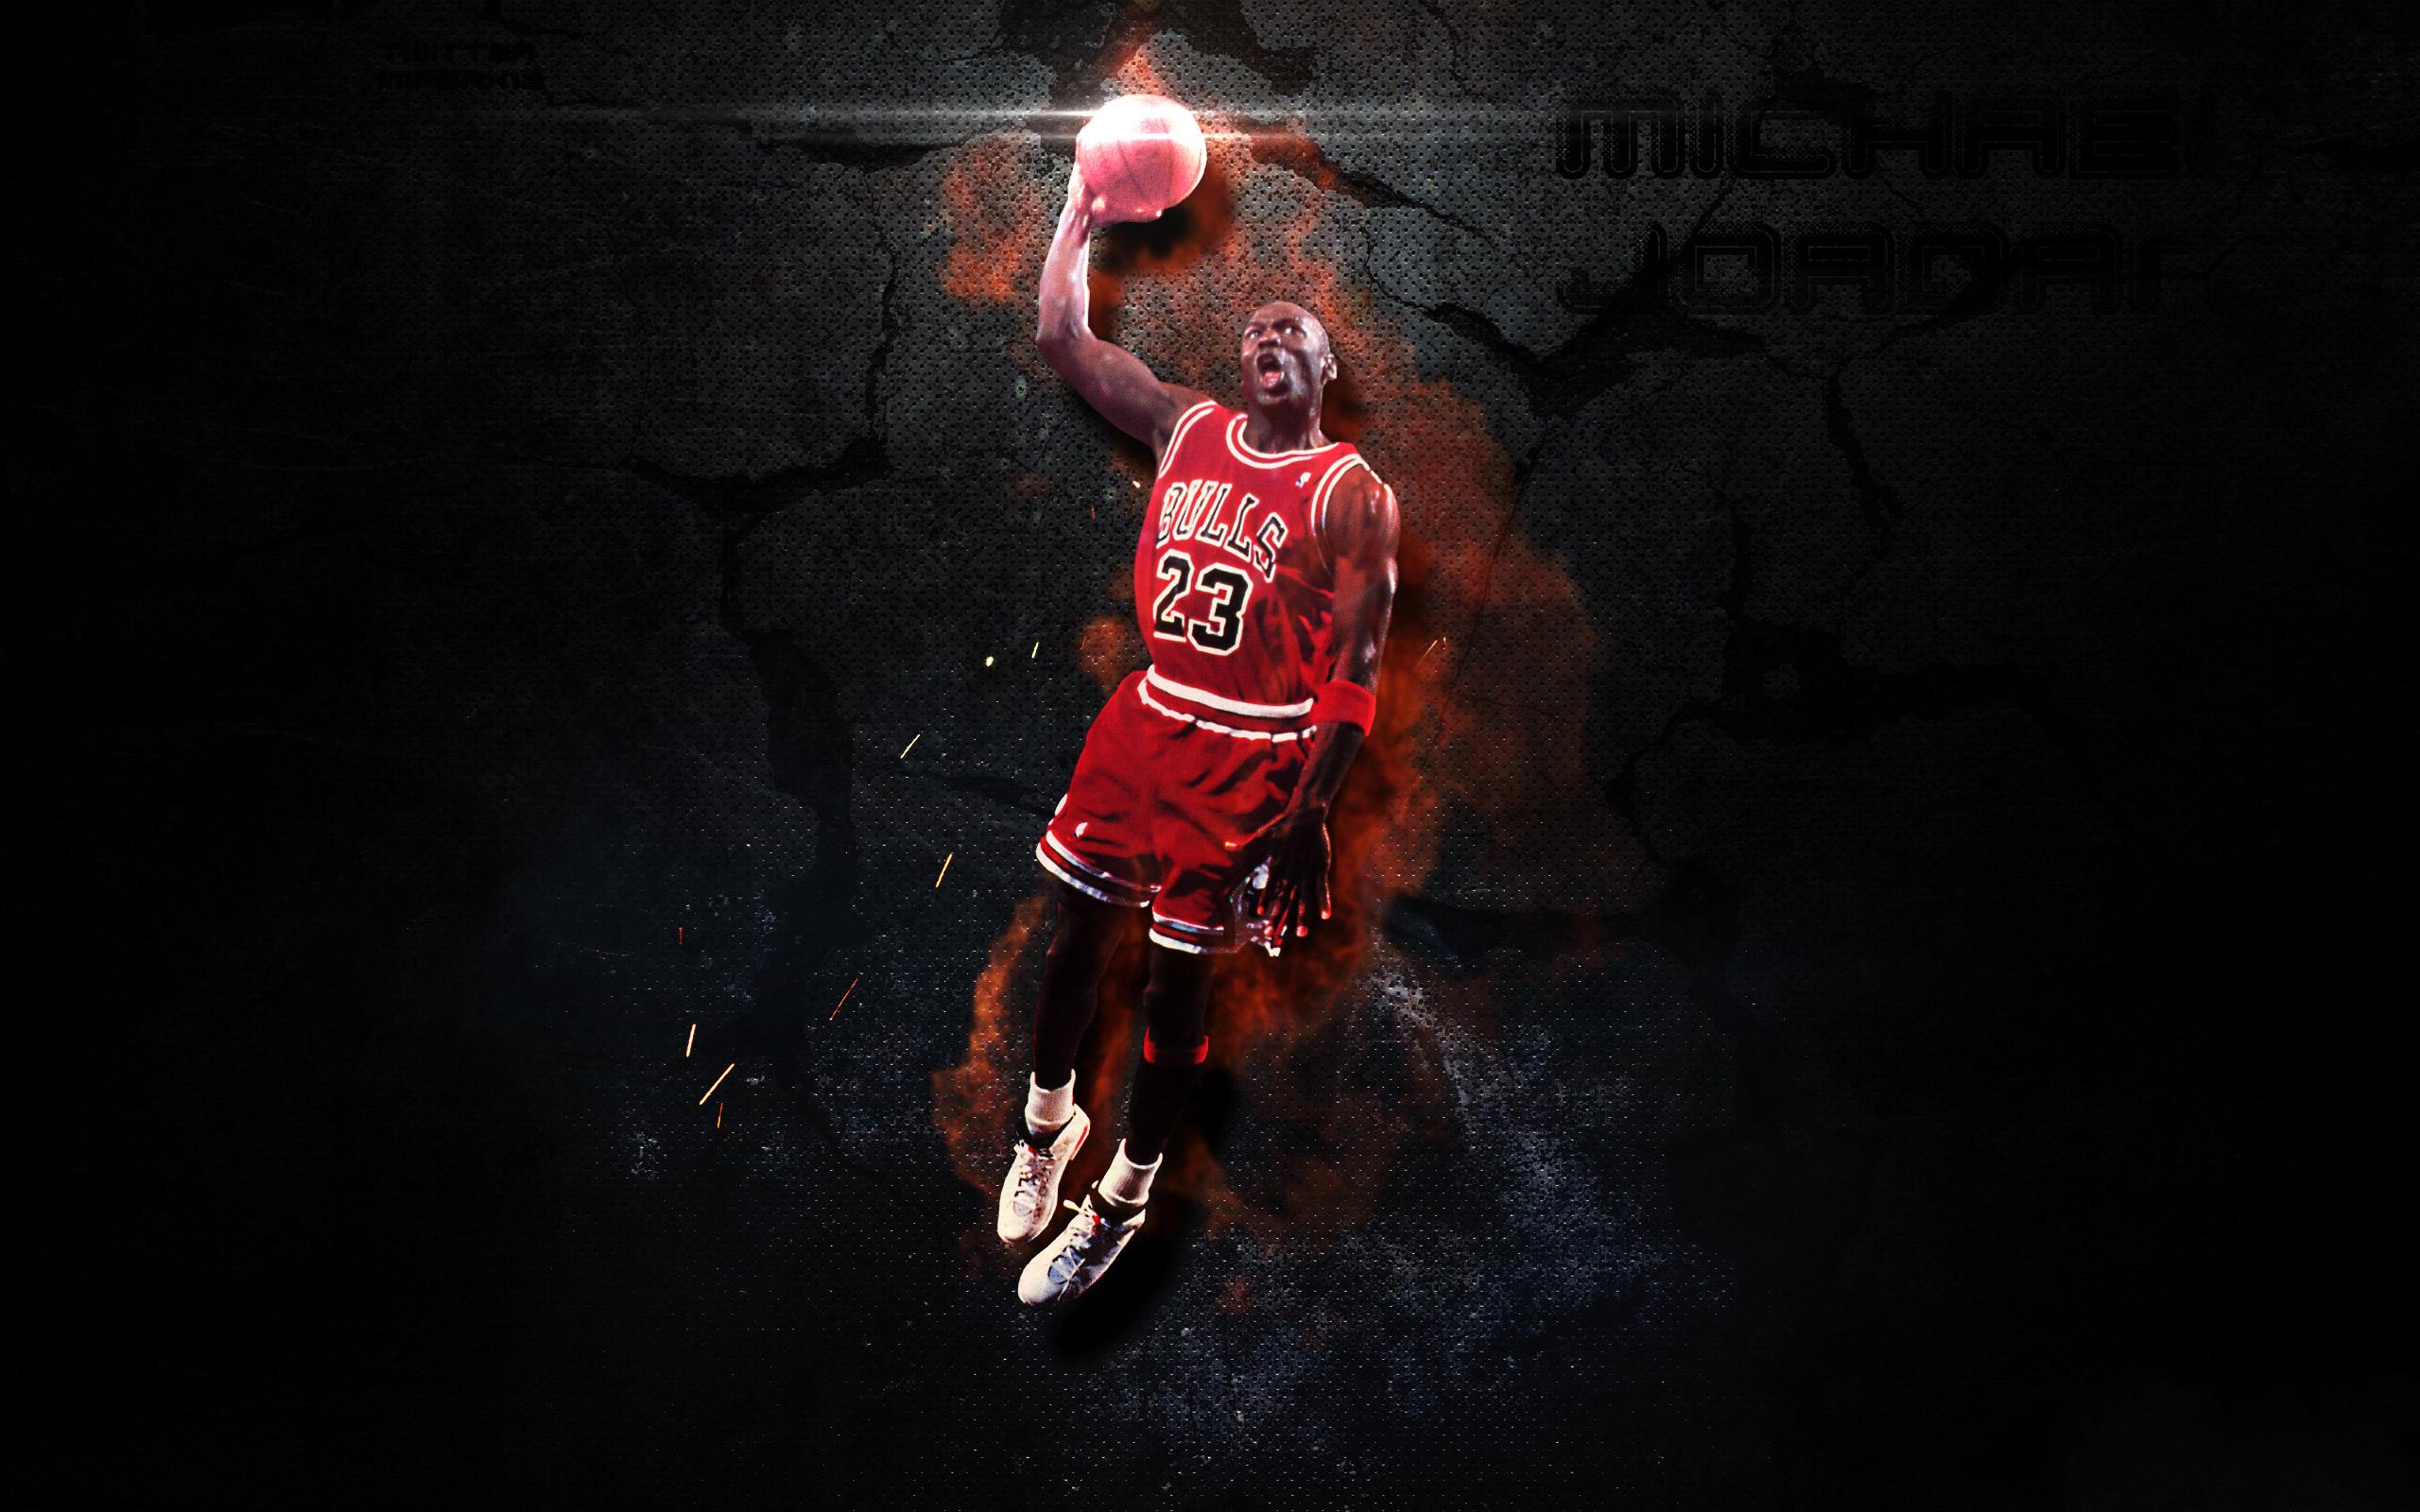 Jordan Wallpapers HD download Wallpapers Backgrounds Images 2560x1600